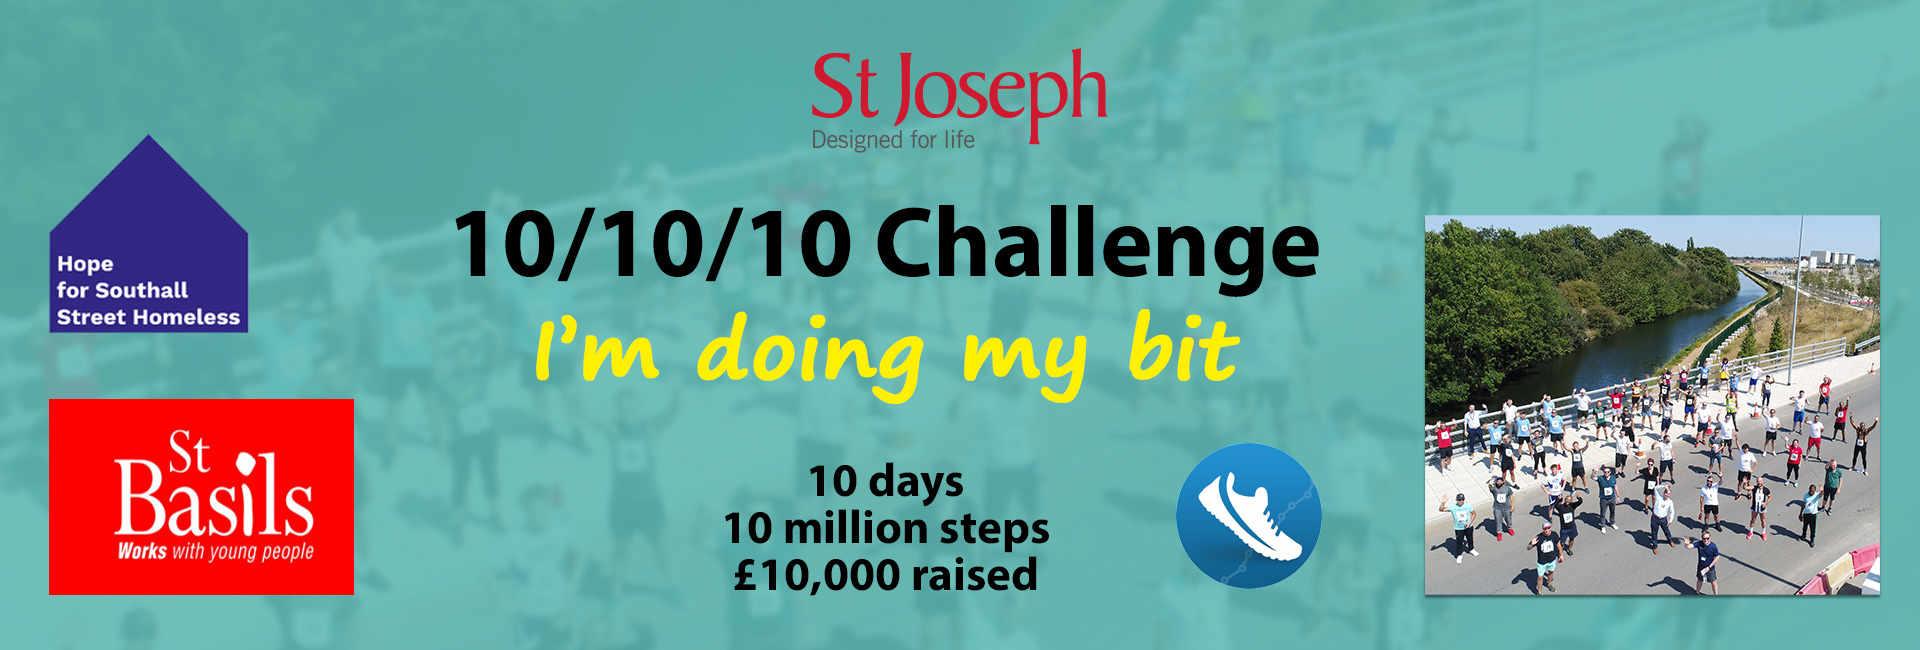 St Joseph 10 10 10 Challenge